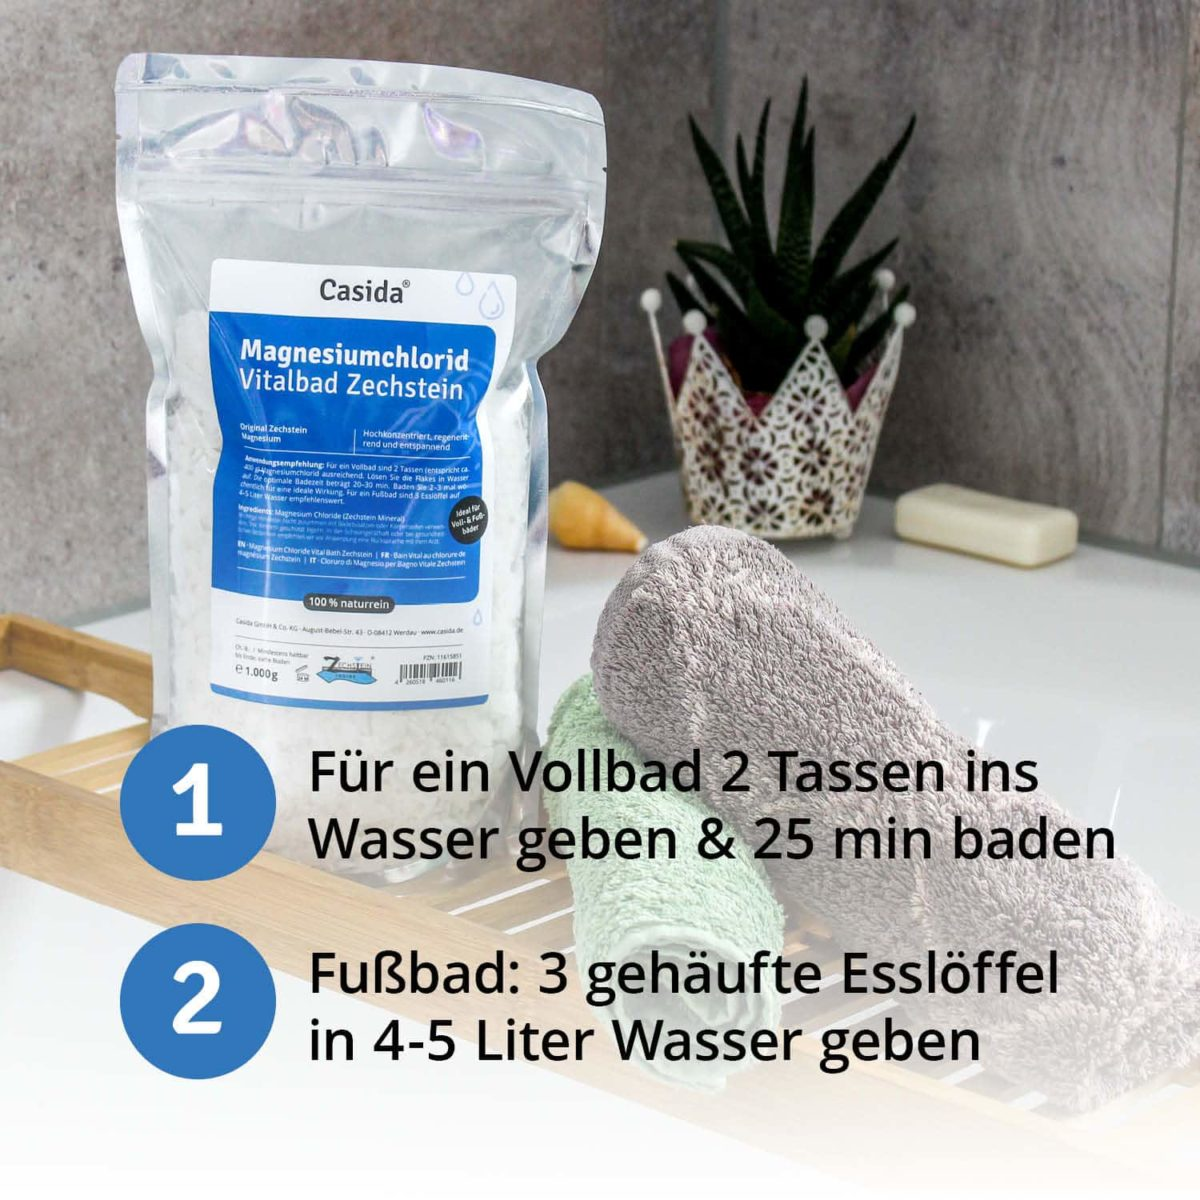 Casida Magnesiumchlorid Vitalbad Zechstein 1,0 kg 11615851 PZN Apotheke Muskelkater Sole Vollbad Fußbad Salz6